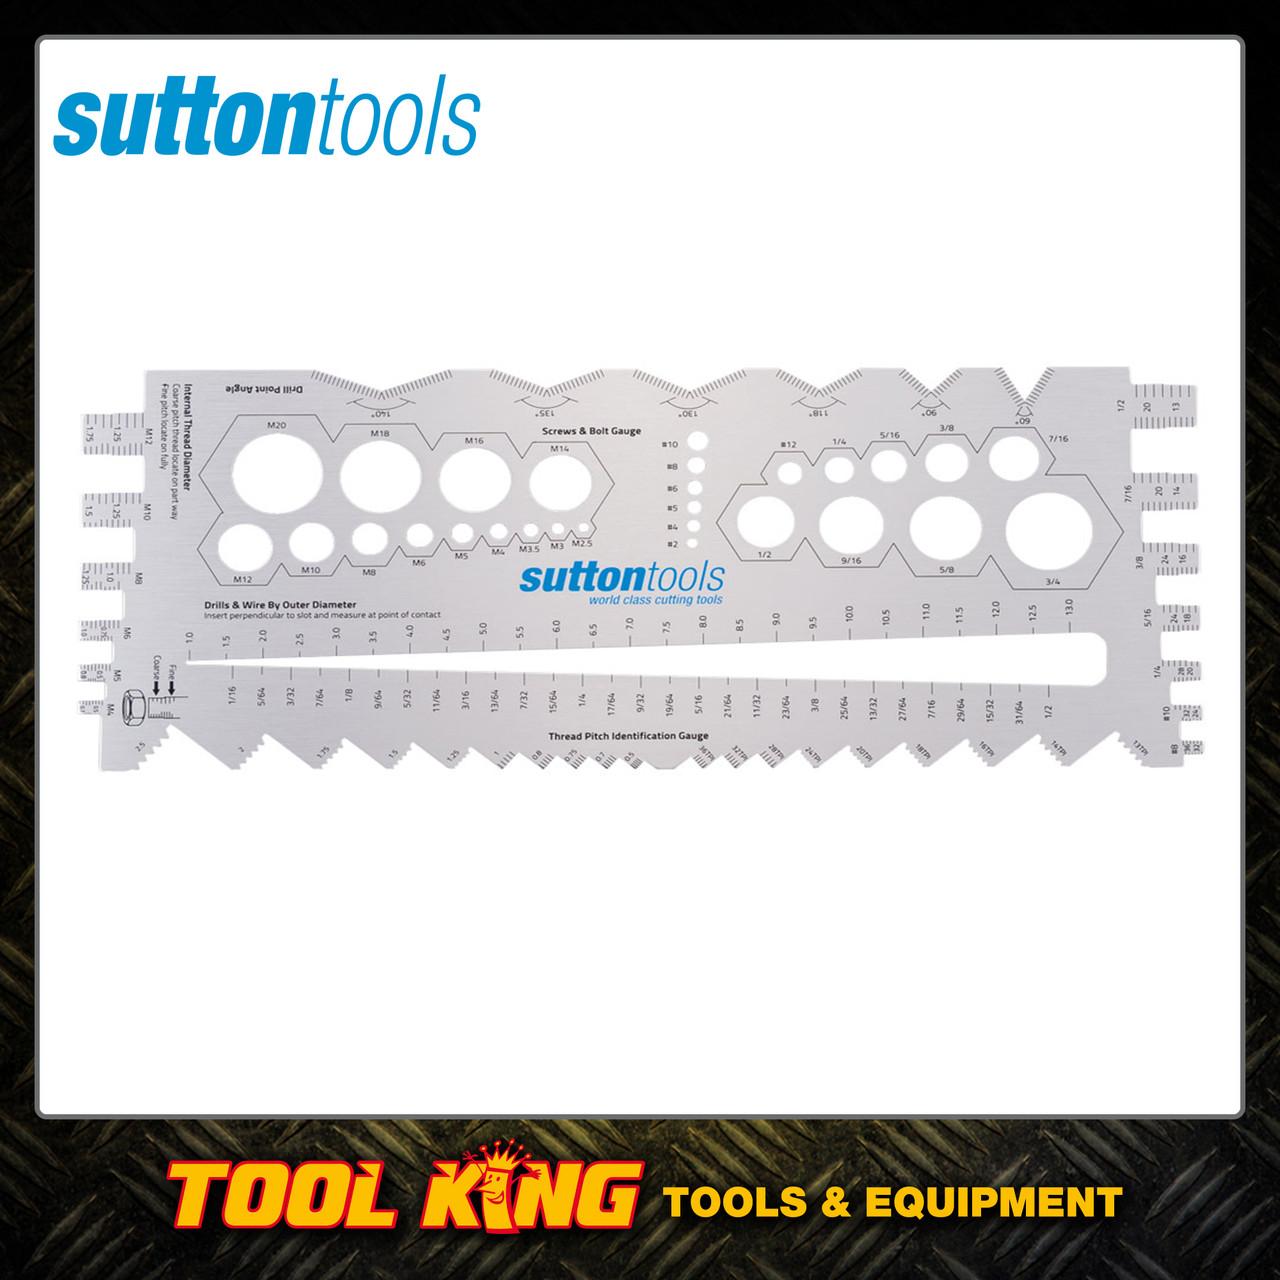 Sutton Multi Function Thread pitch, drill bit, screw and bolt gauge